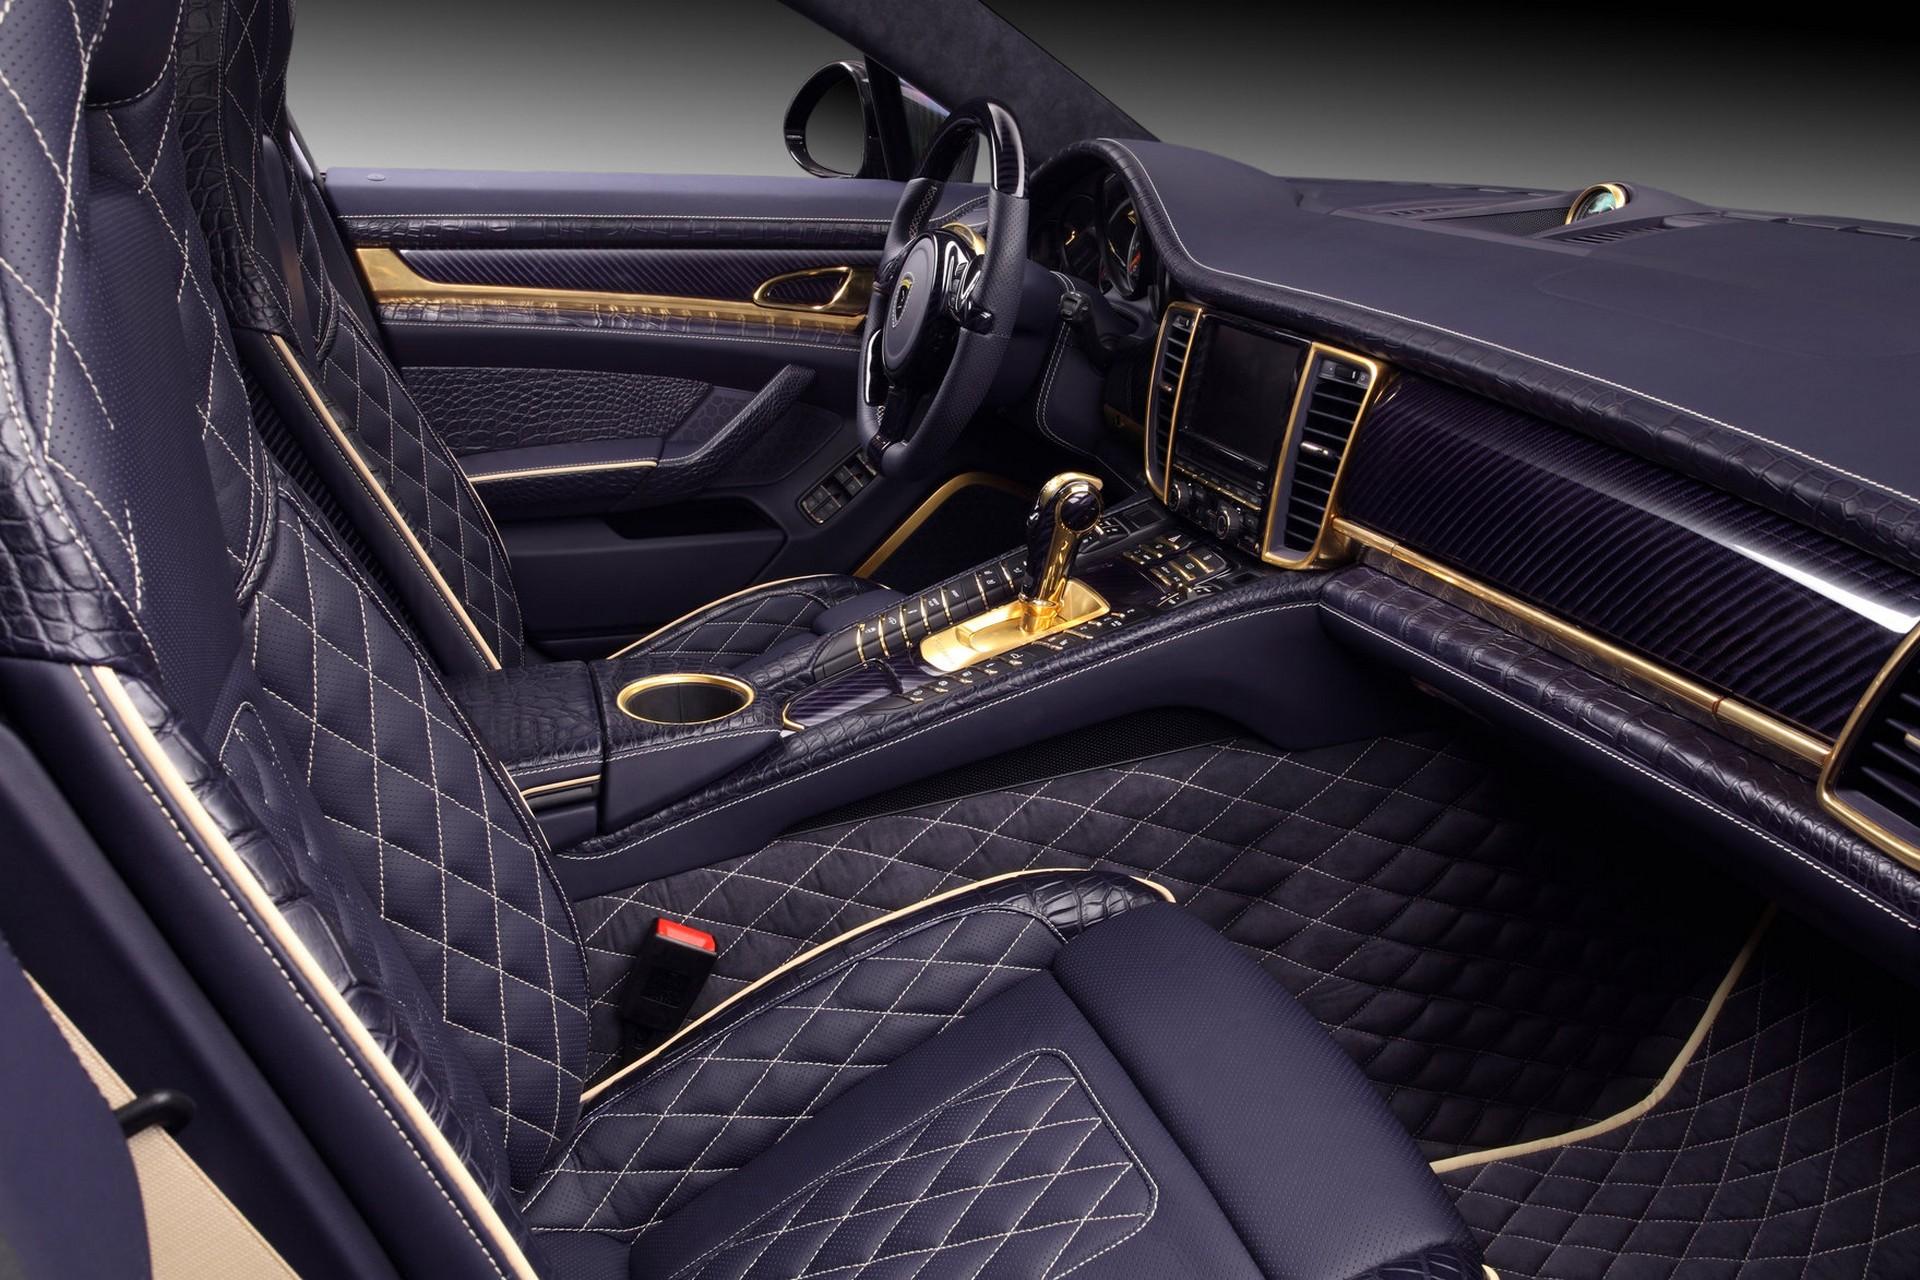 2014 porsche panamera interior car tuning -  Porsche Panamera Stingray Gtr Special Edition